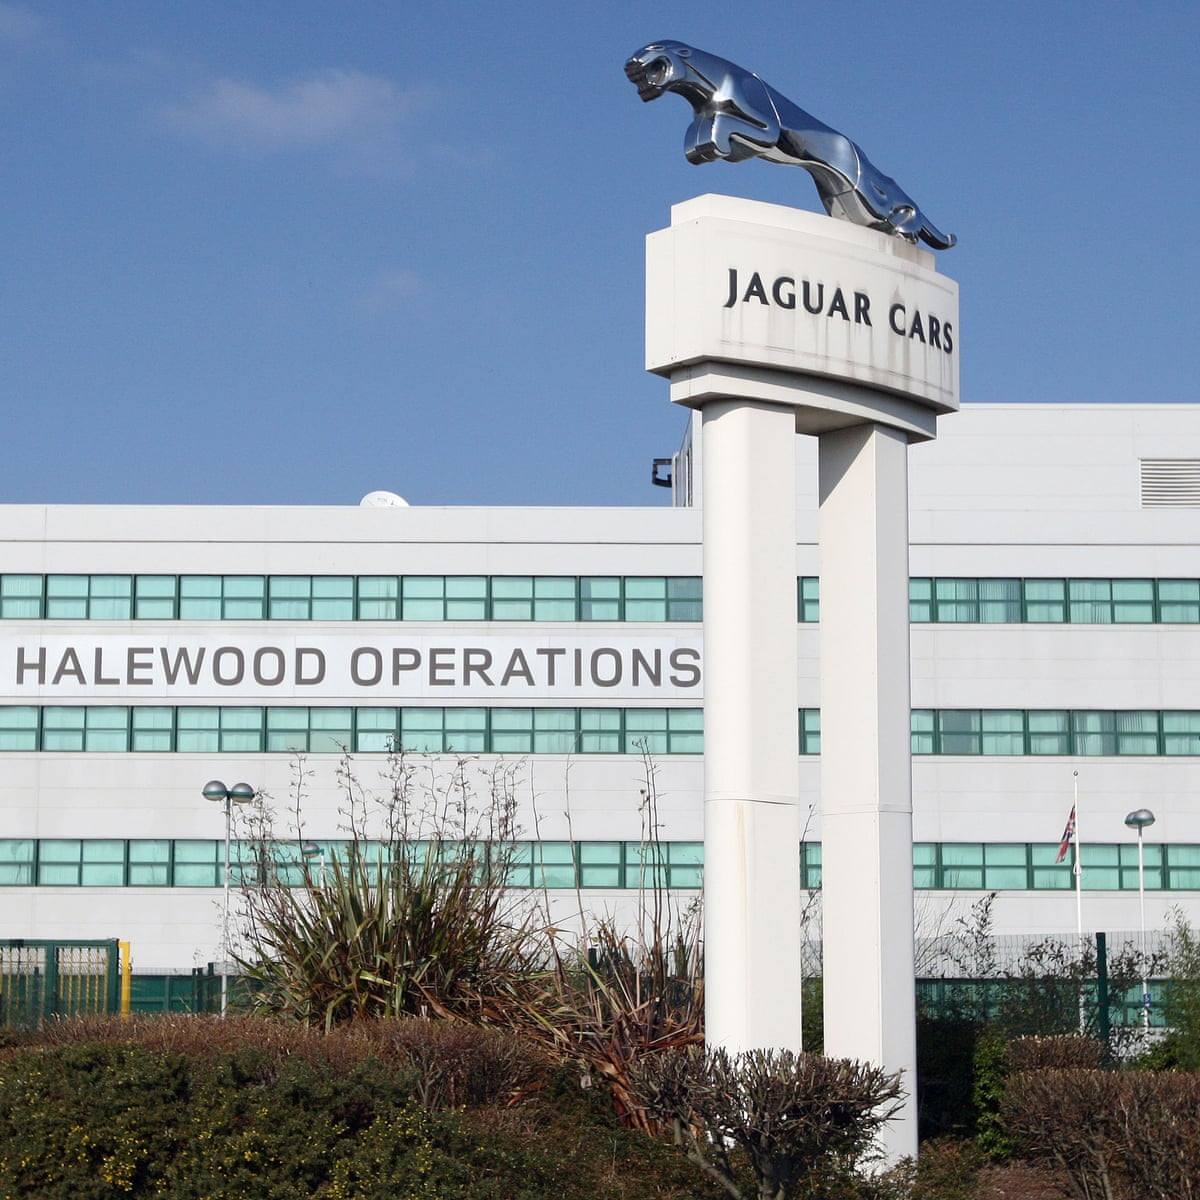 Jaguar Land Rover To Shut Merseyside Plant For Nine Days Jaguar Land Rover The Guardian